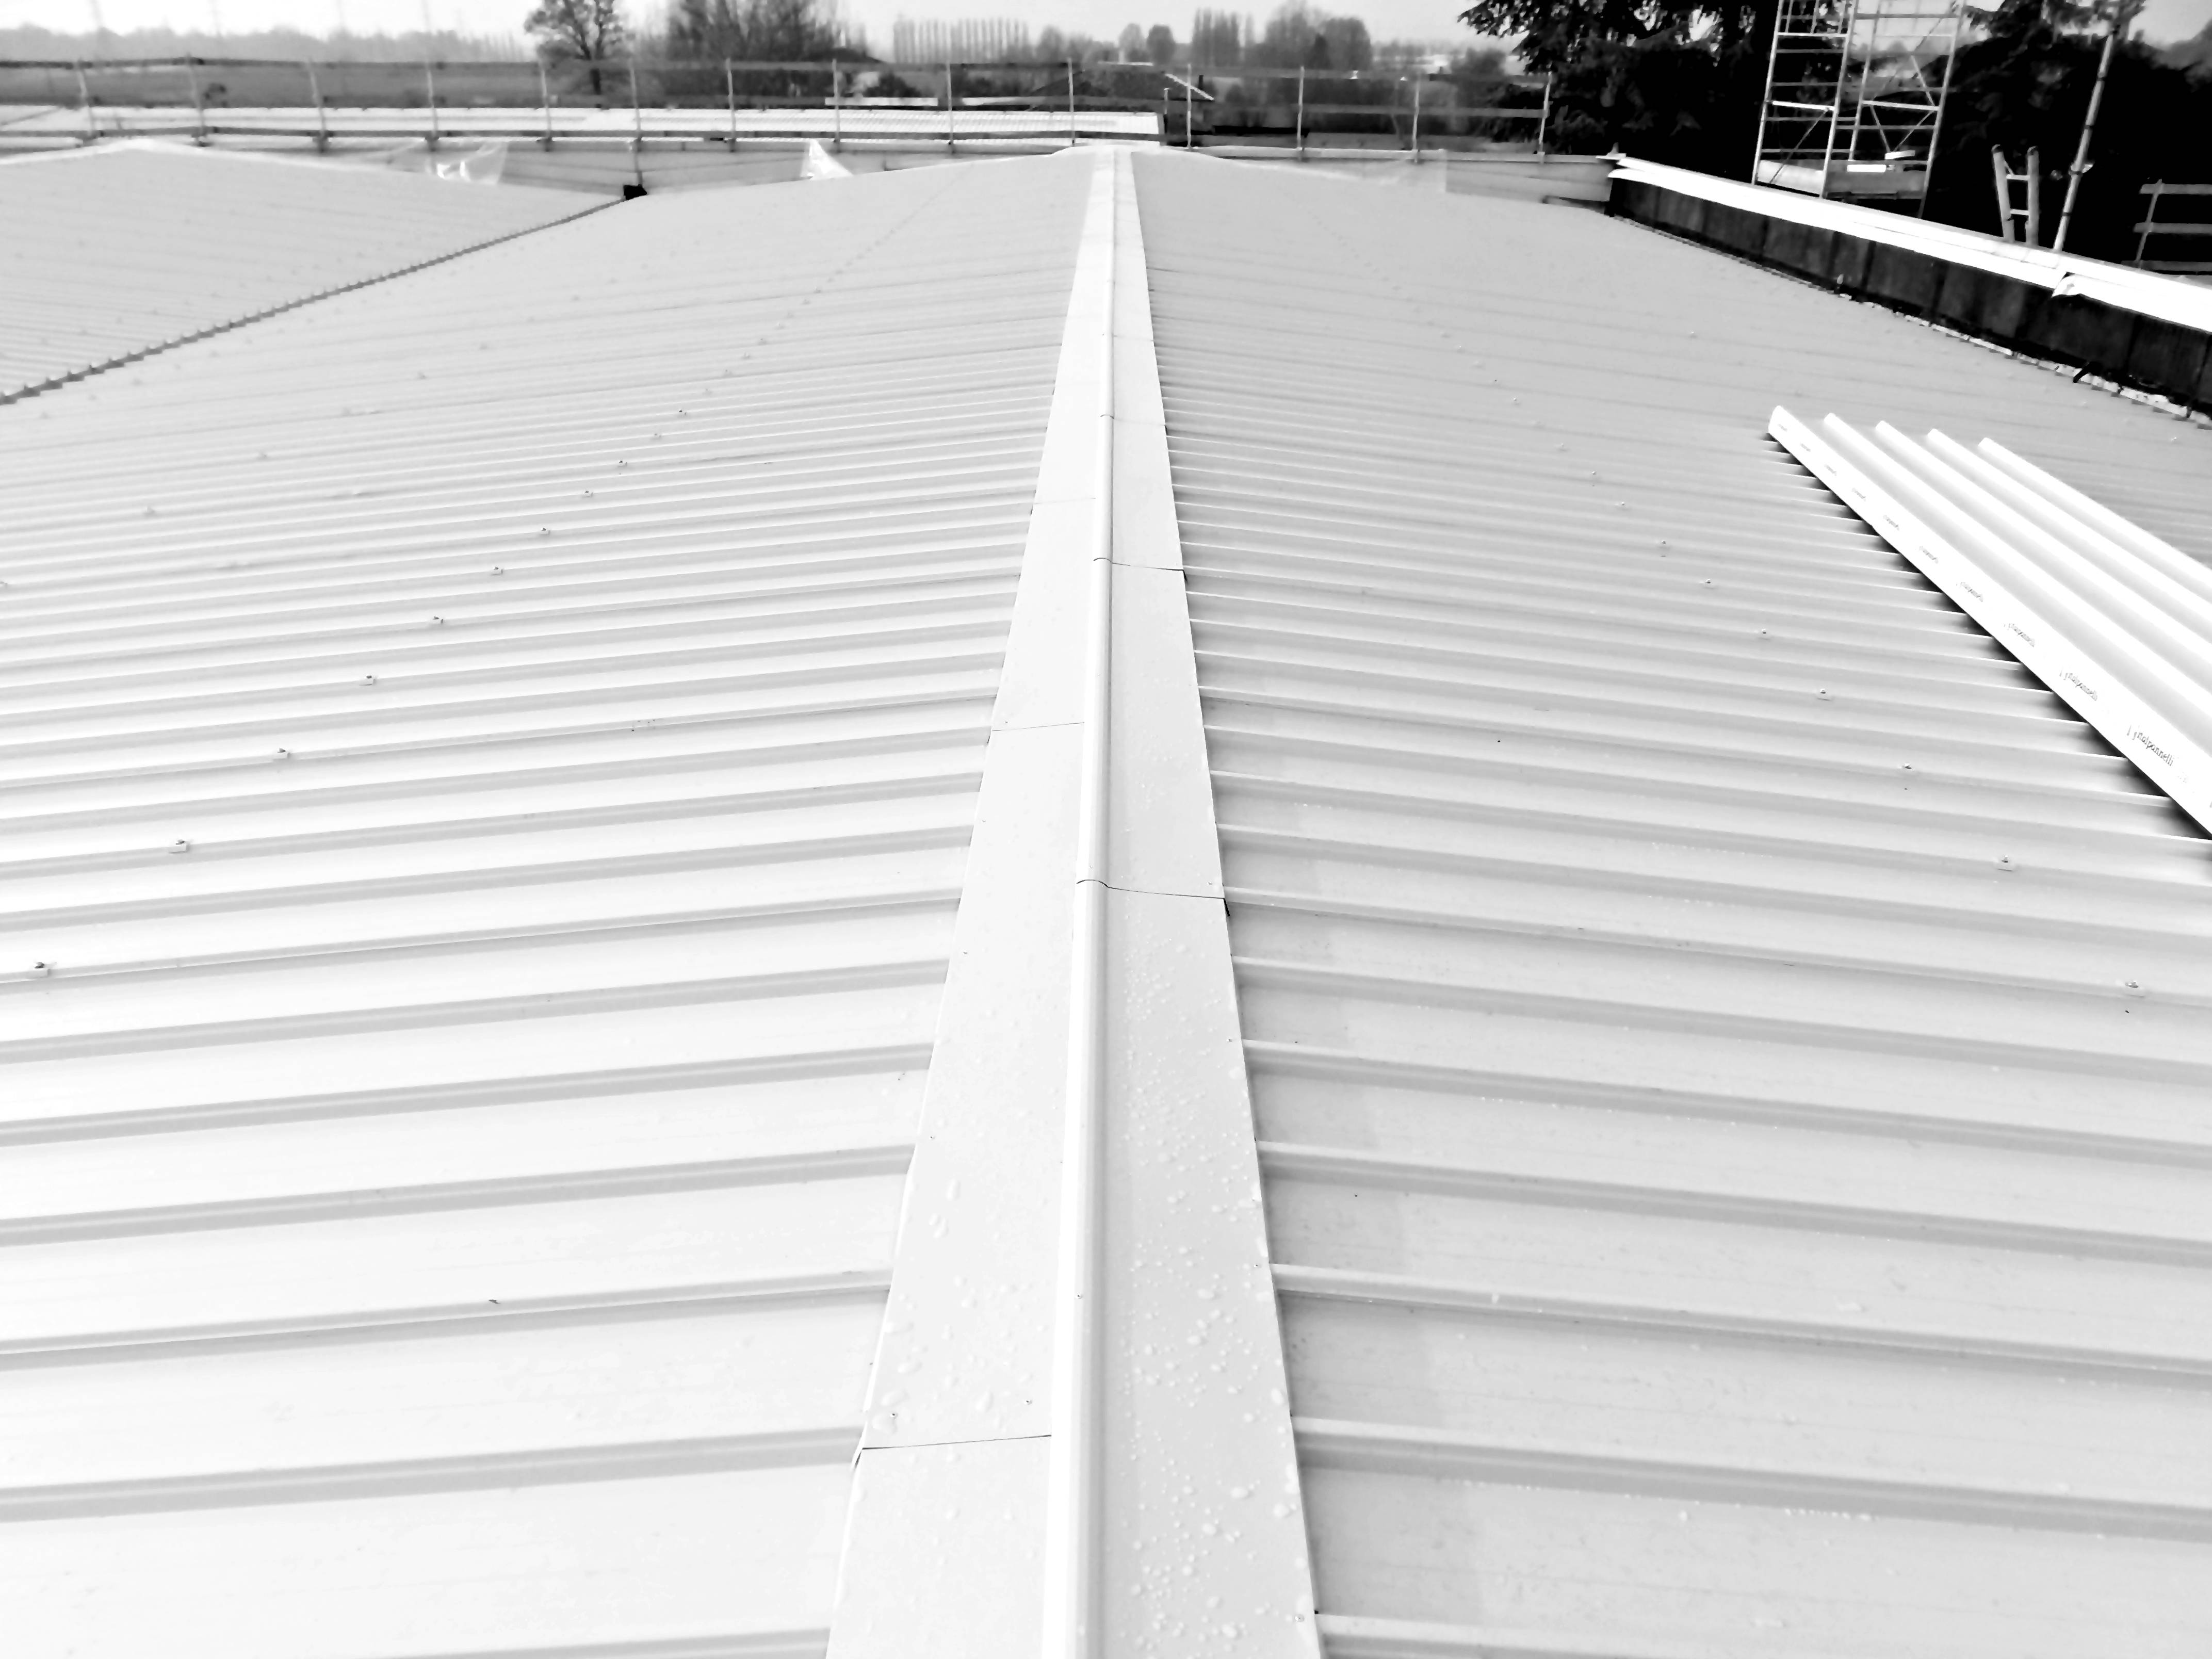 tetto con tubi smaltimento amianto